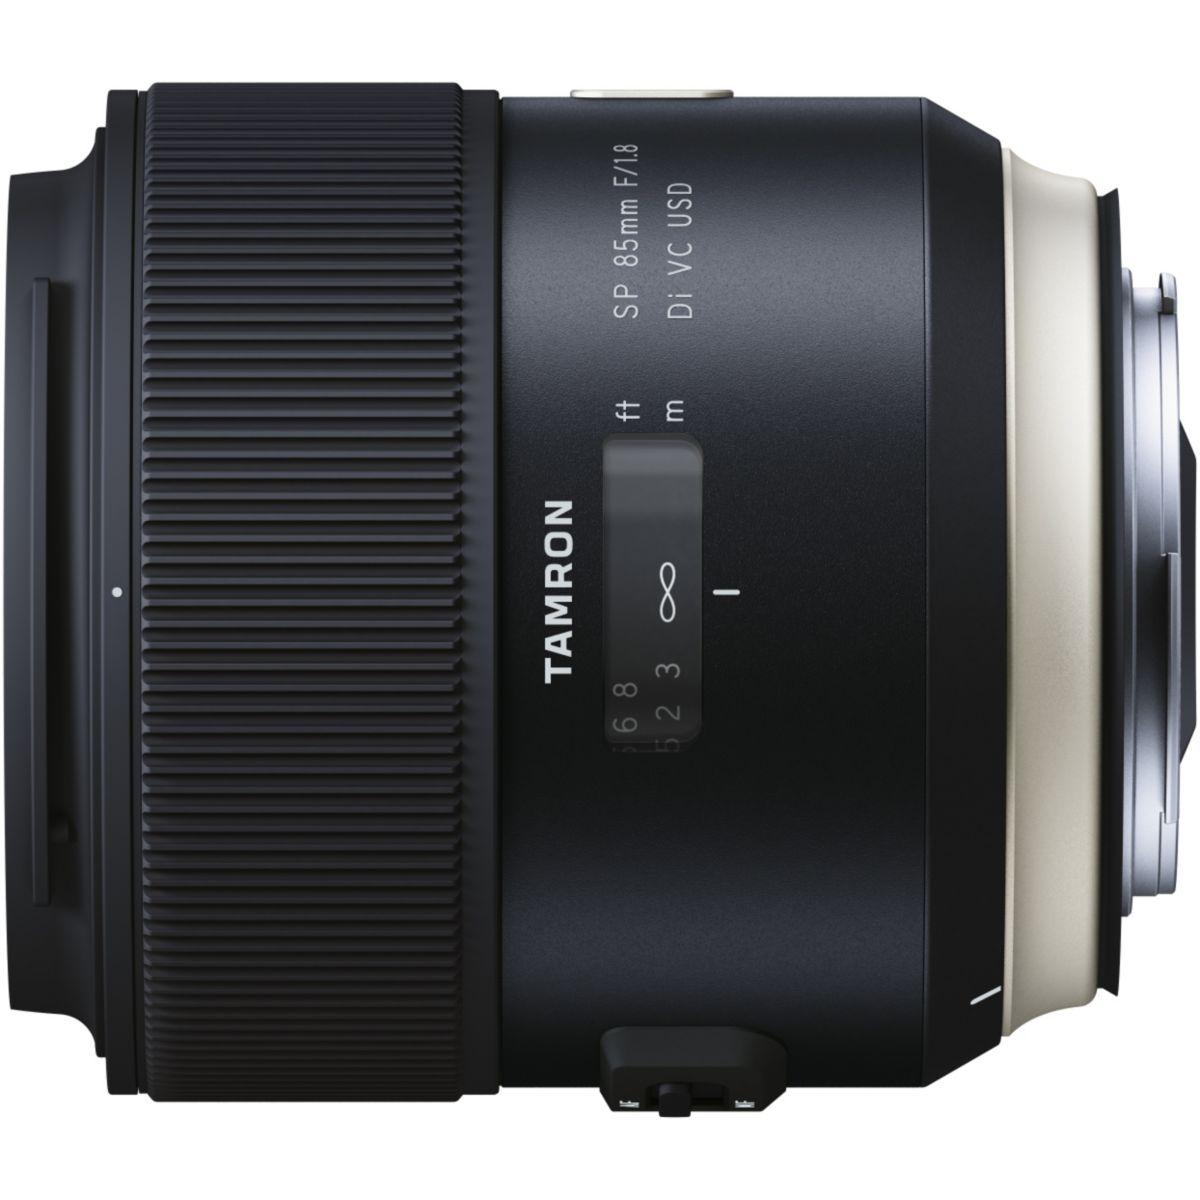 Objectif pour reflex tamron sp 85mm f/1,8 di vc usd canon - 5%...